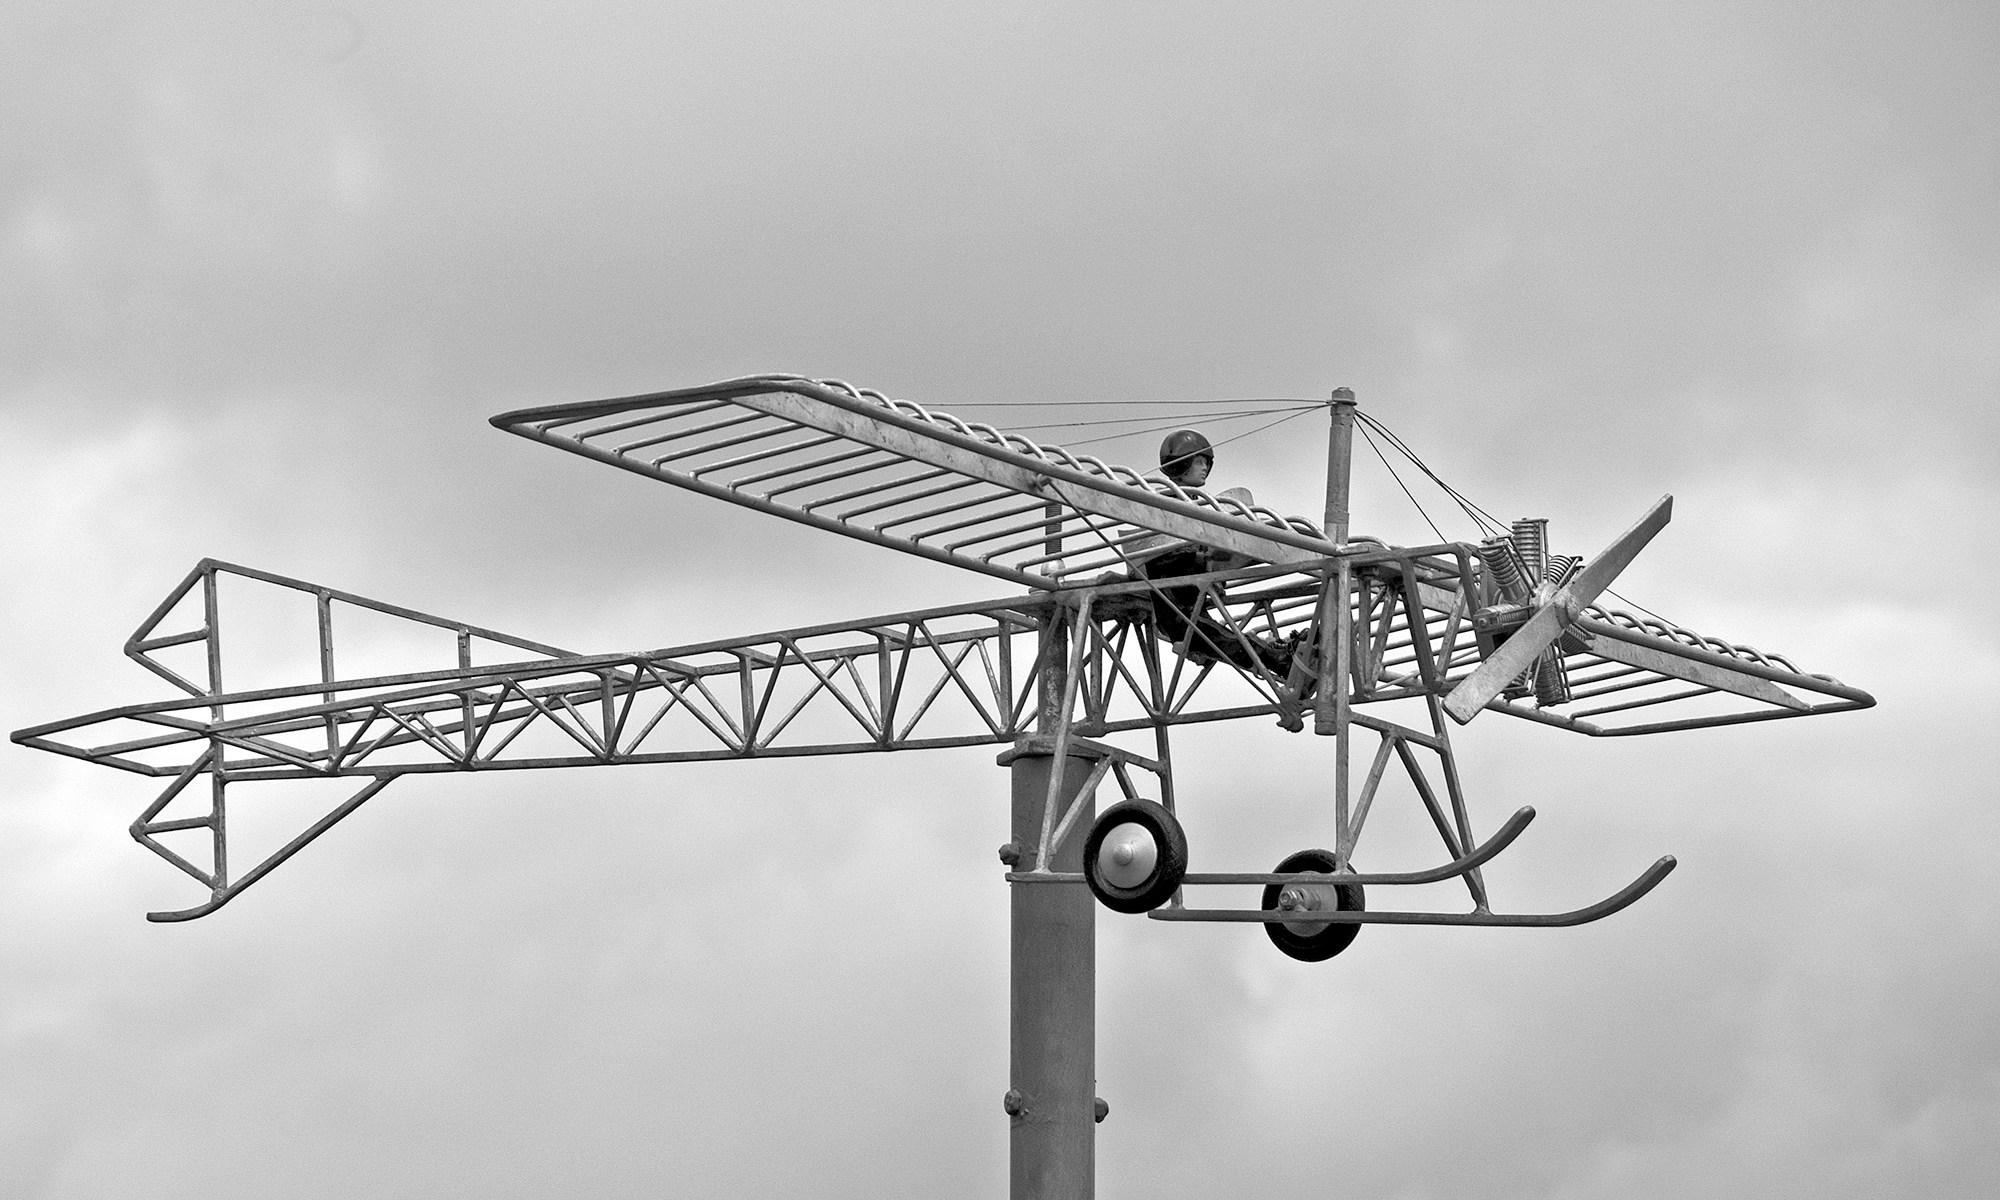 Plane Sculpture in Filey